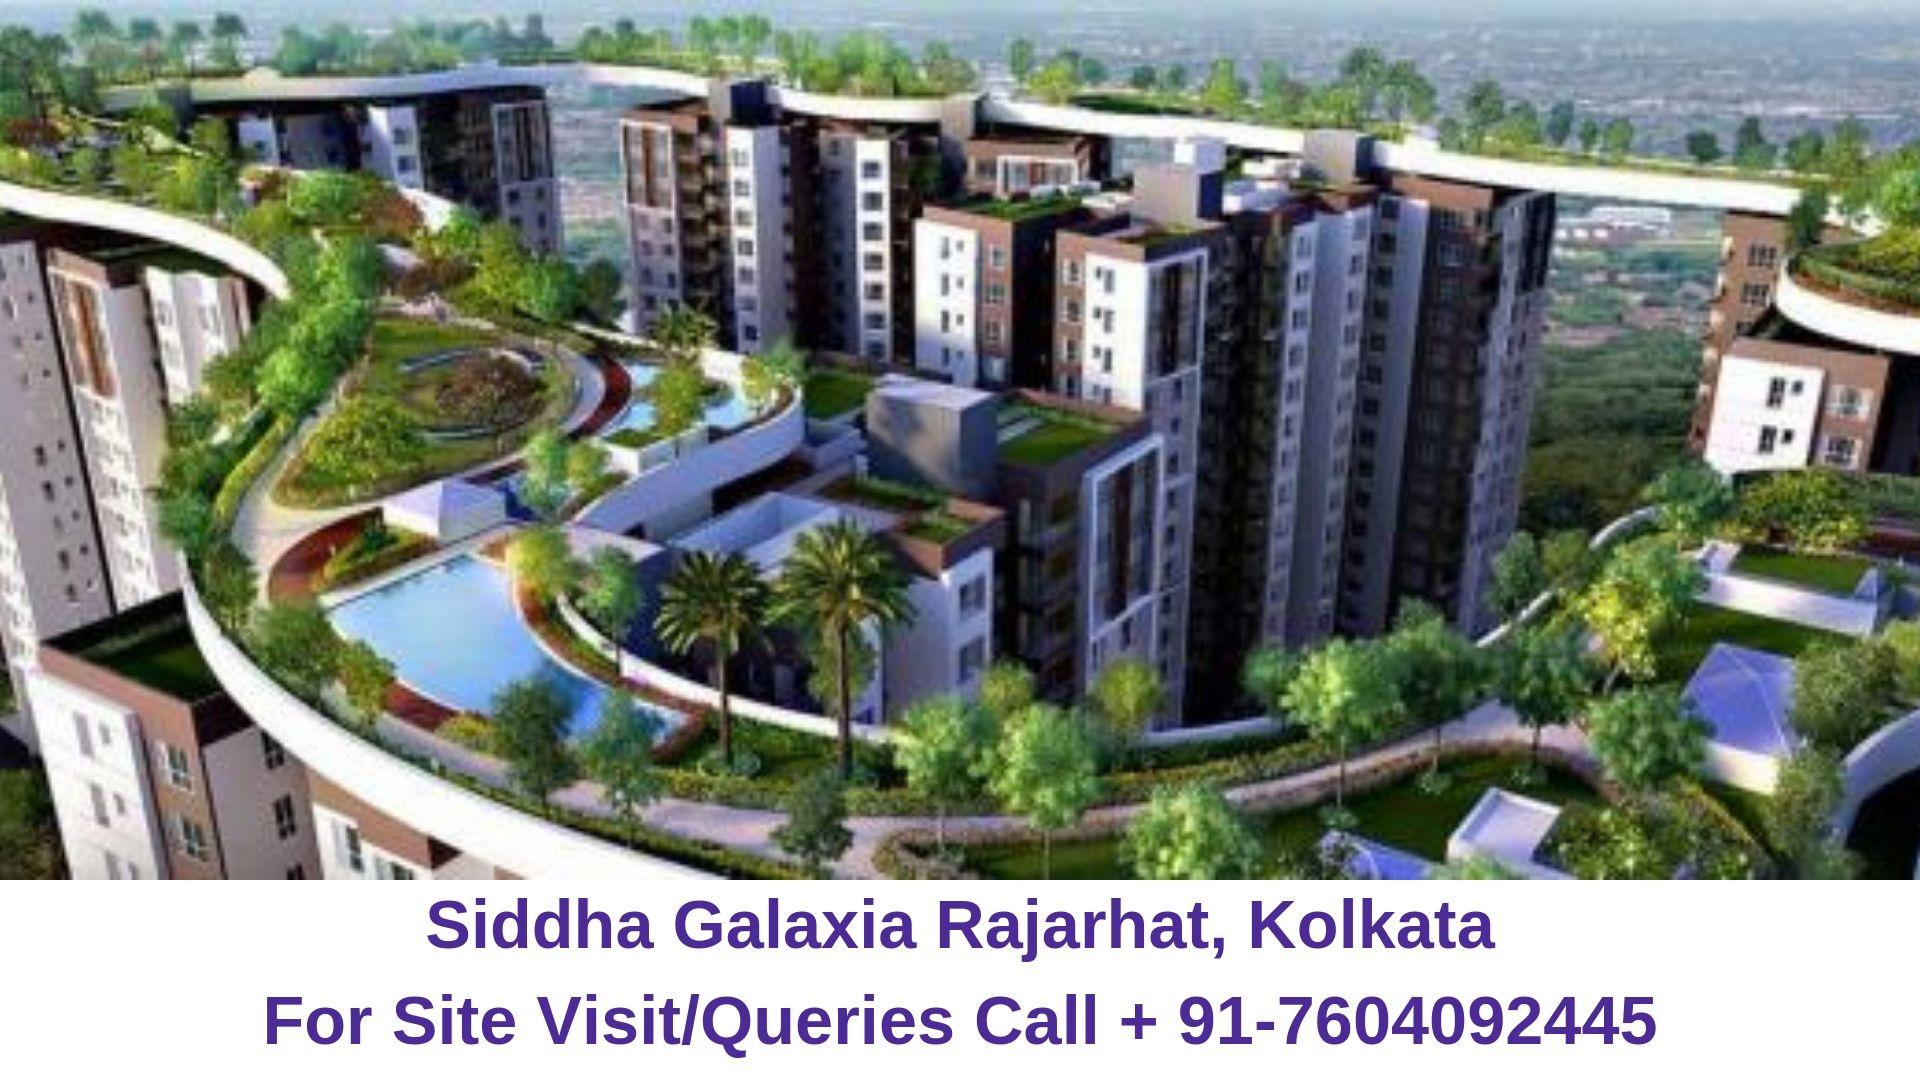 Siddha Galaxia Rajarhat, Kolkata Amenities